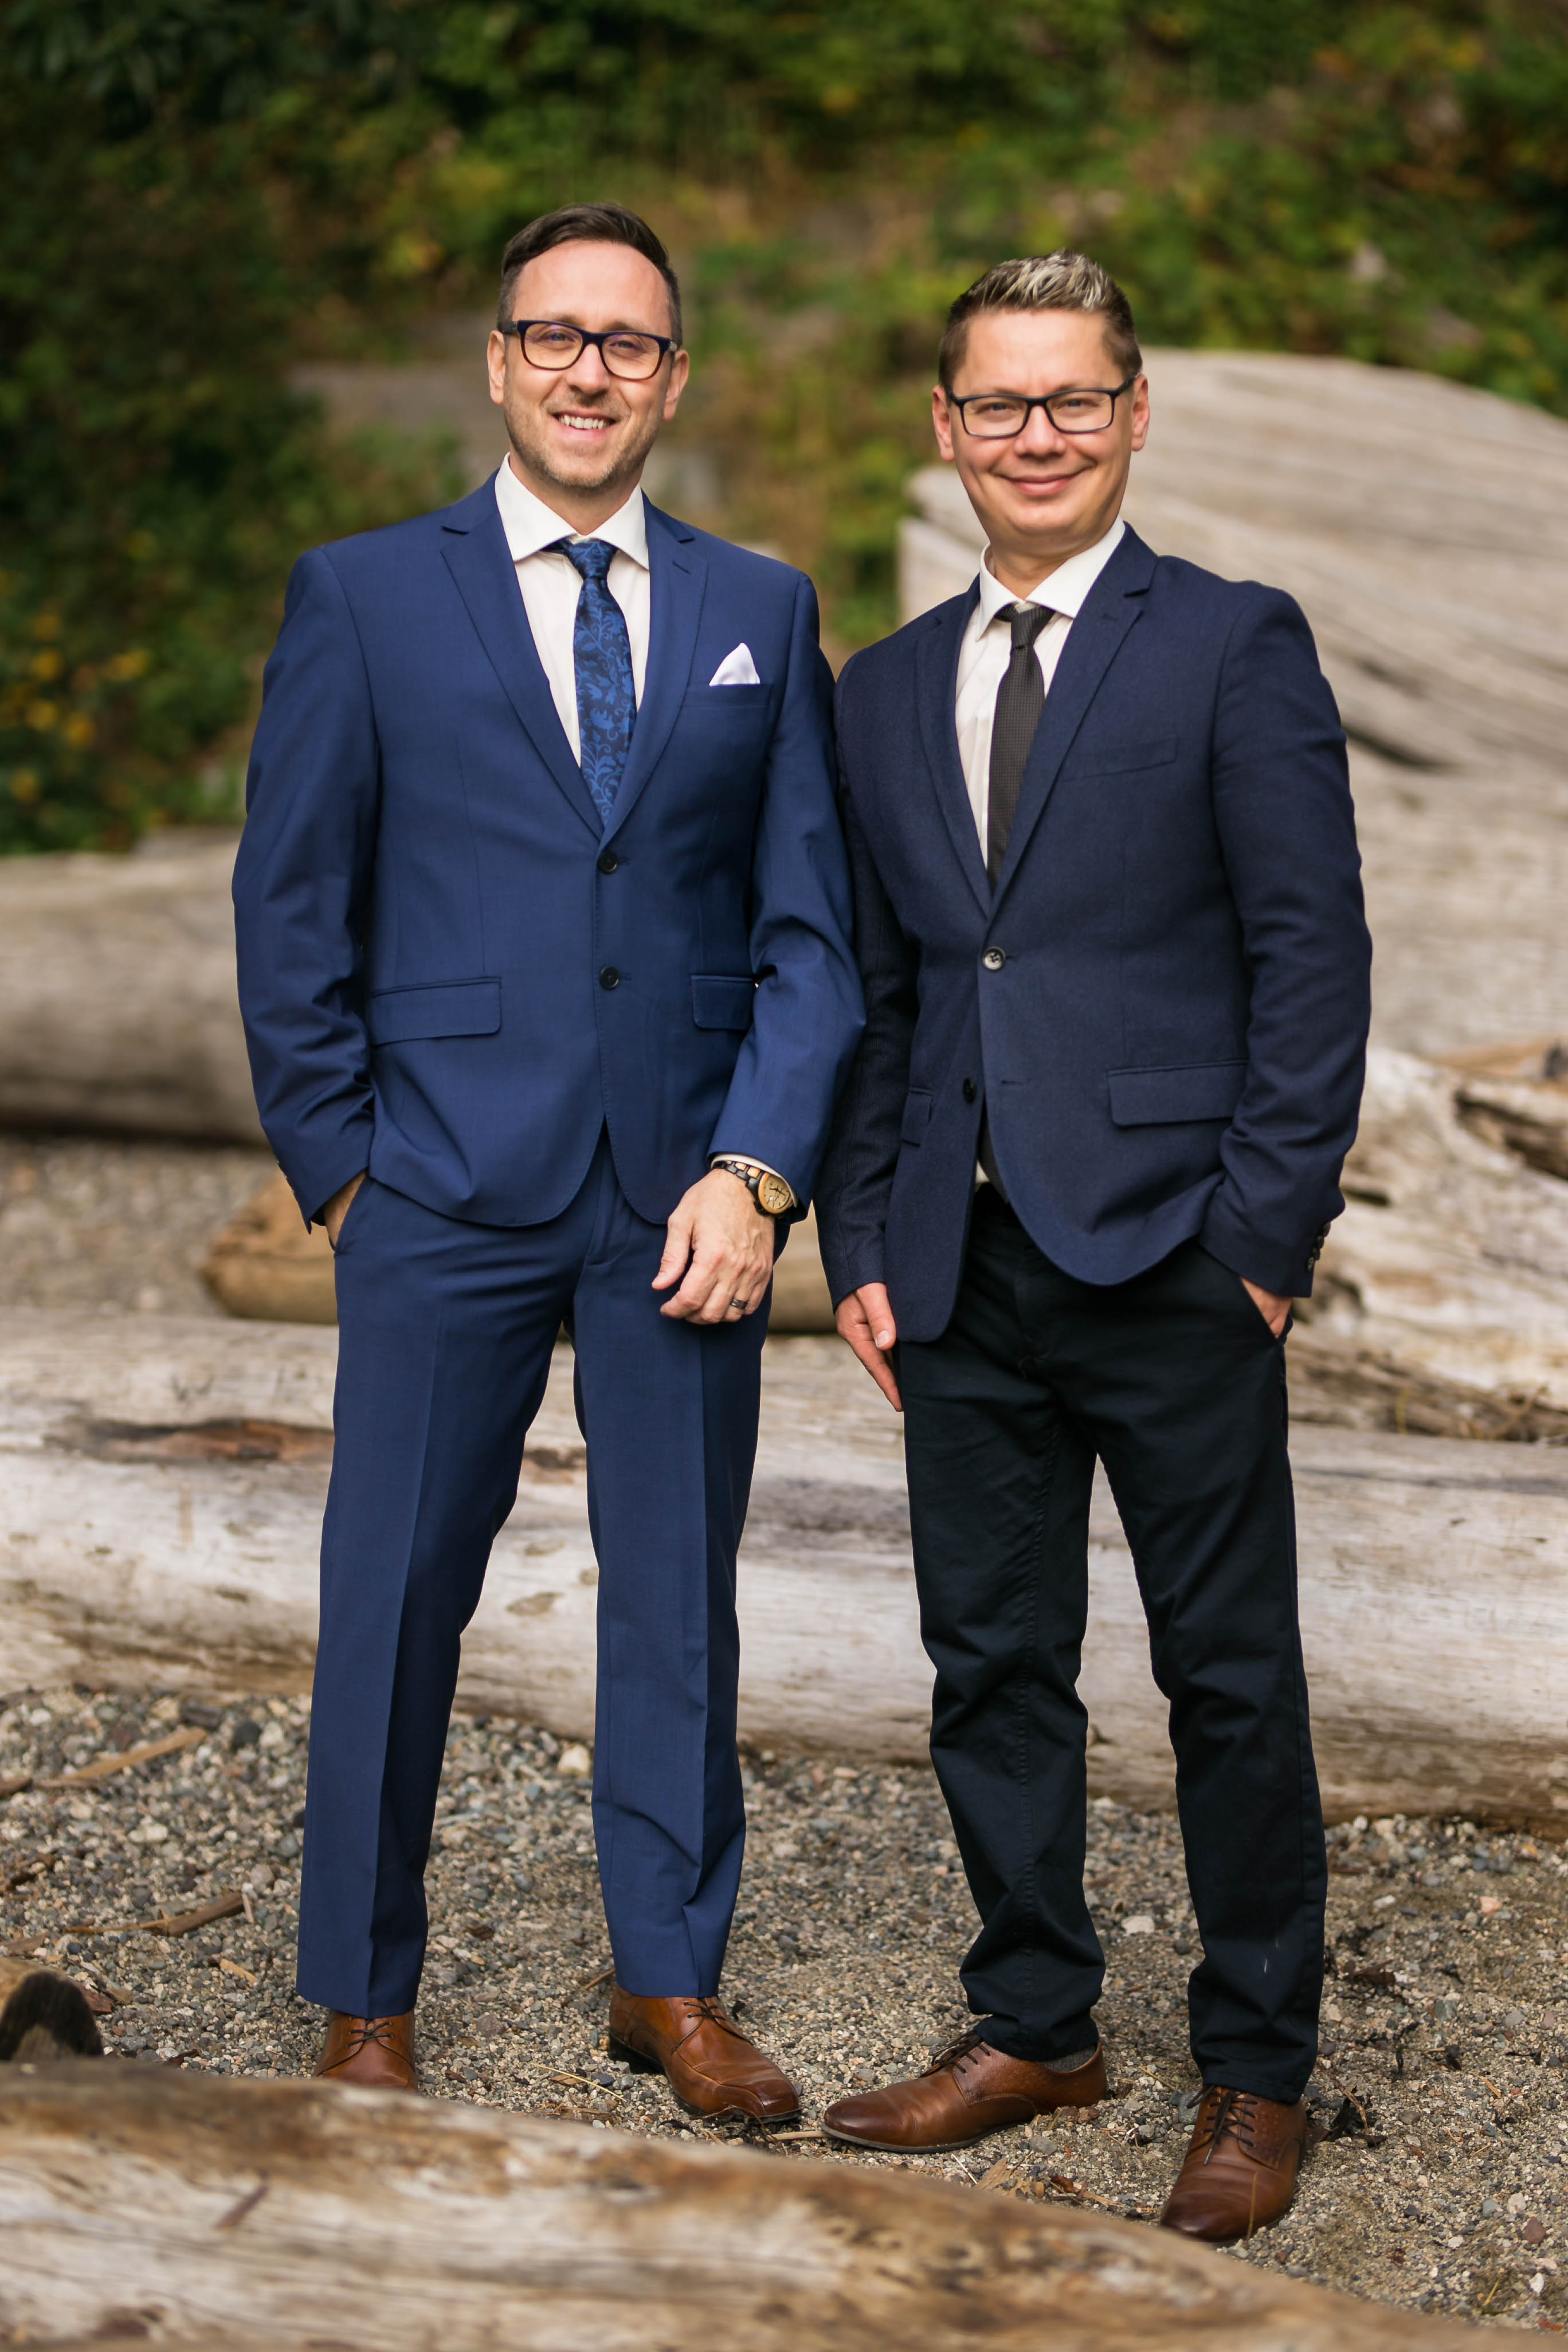 groom and groomsmen pose at wedding